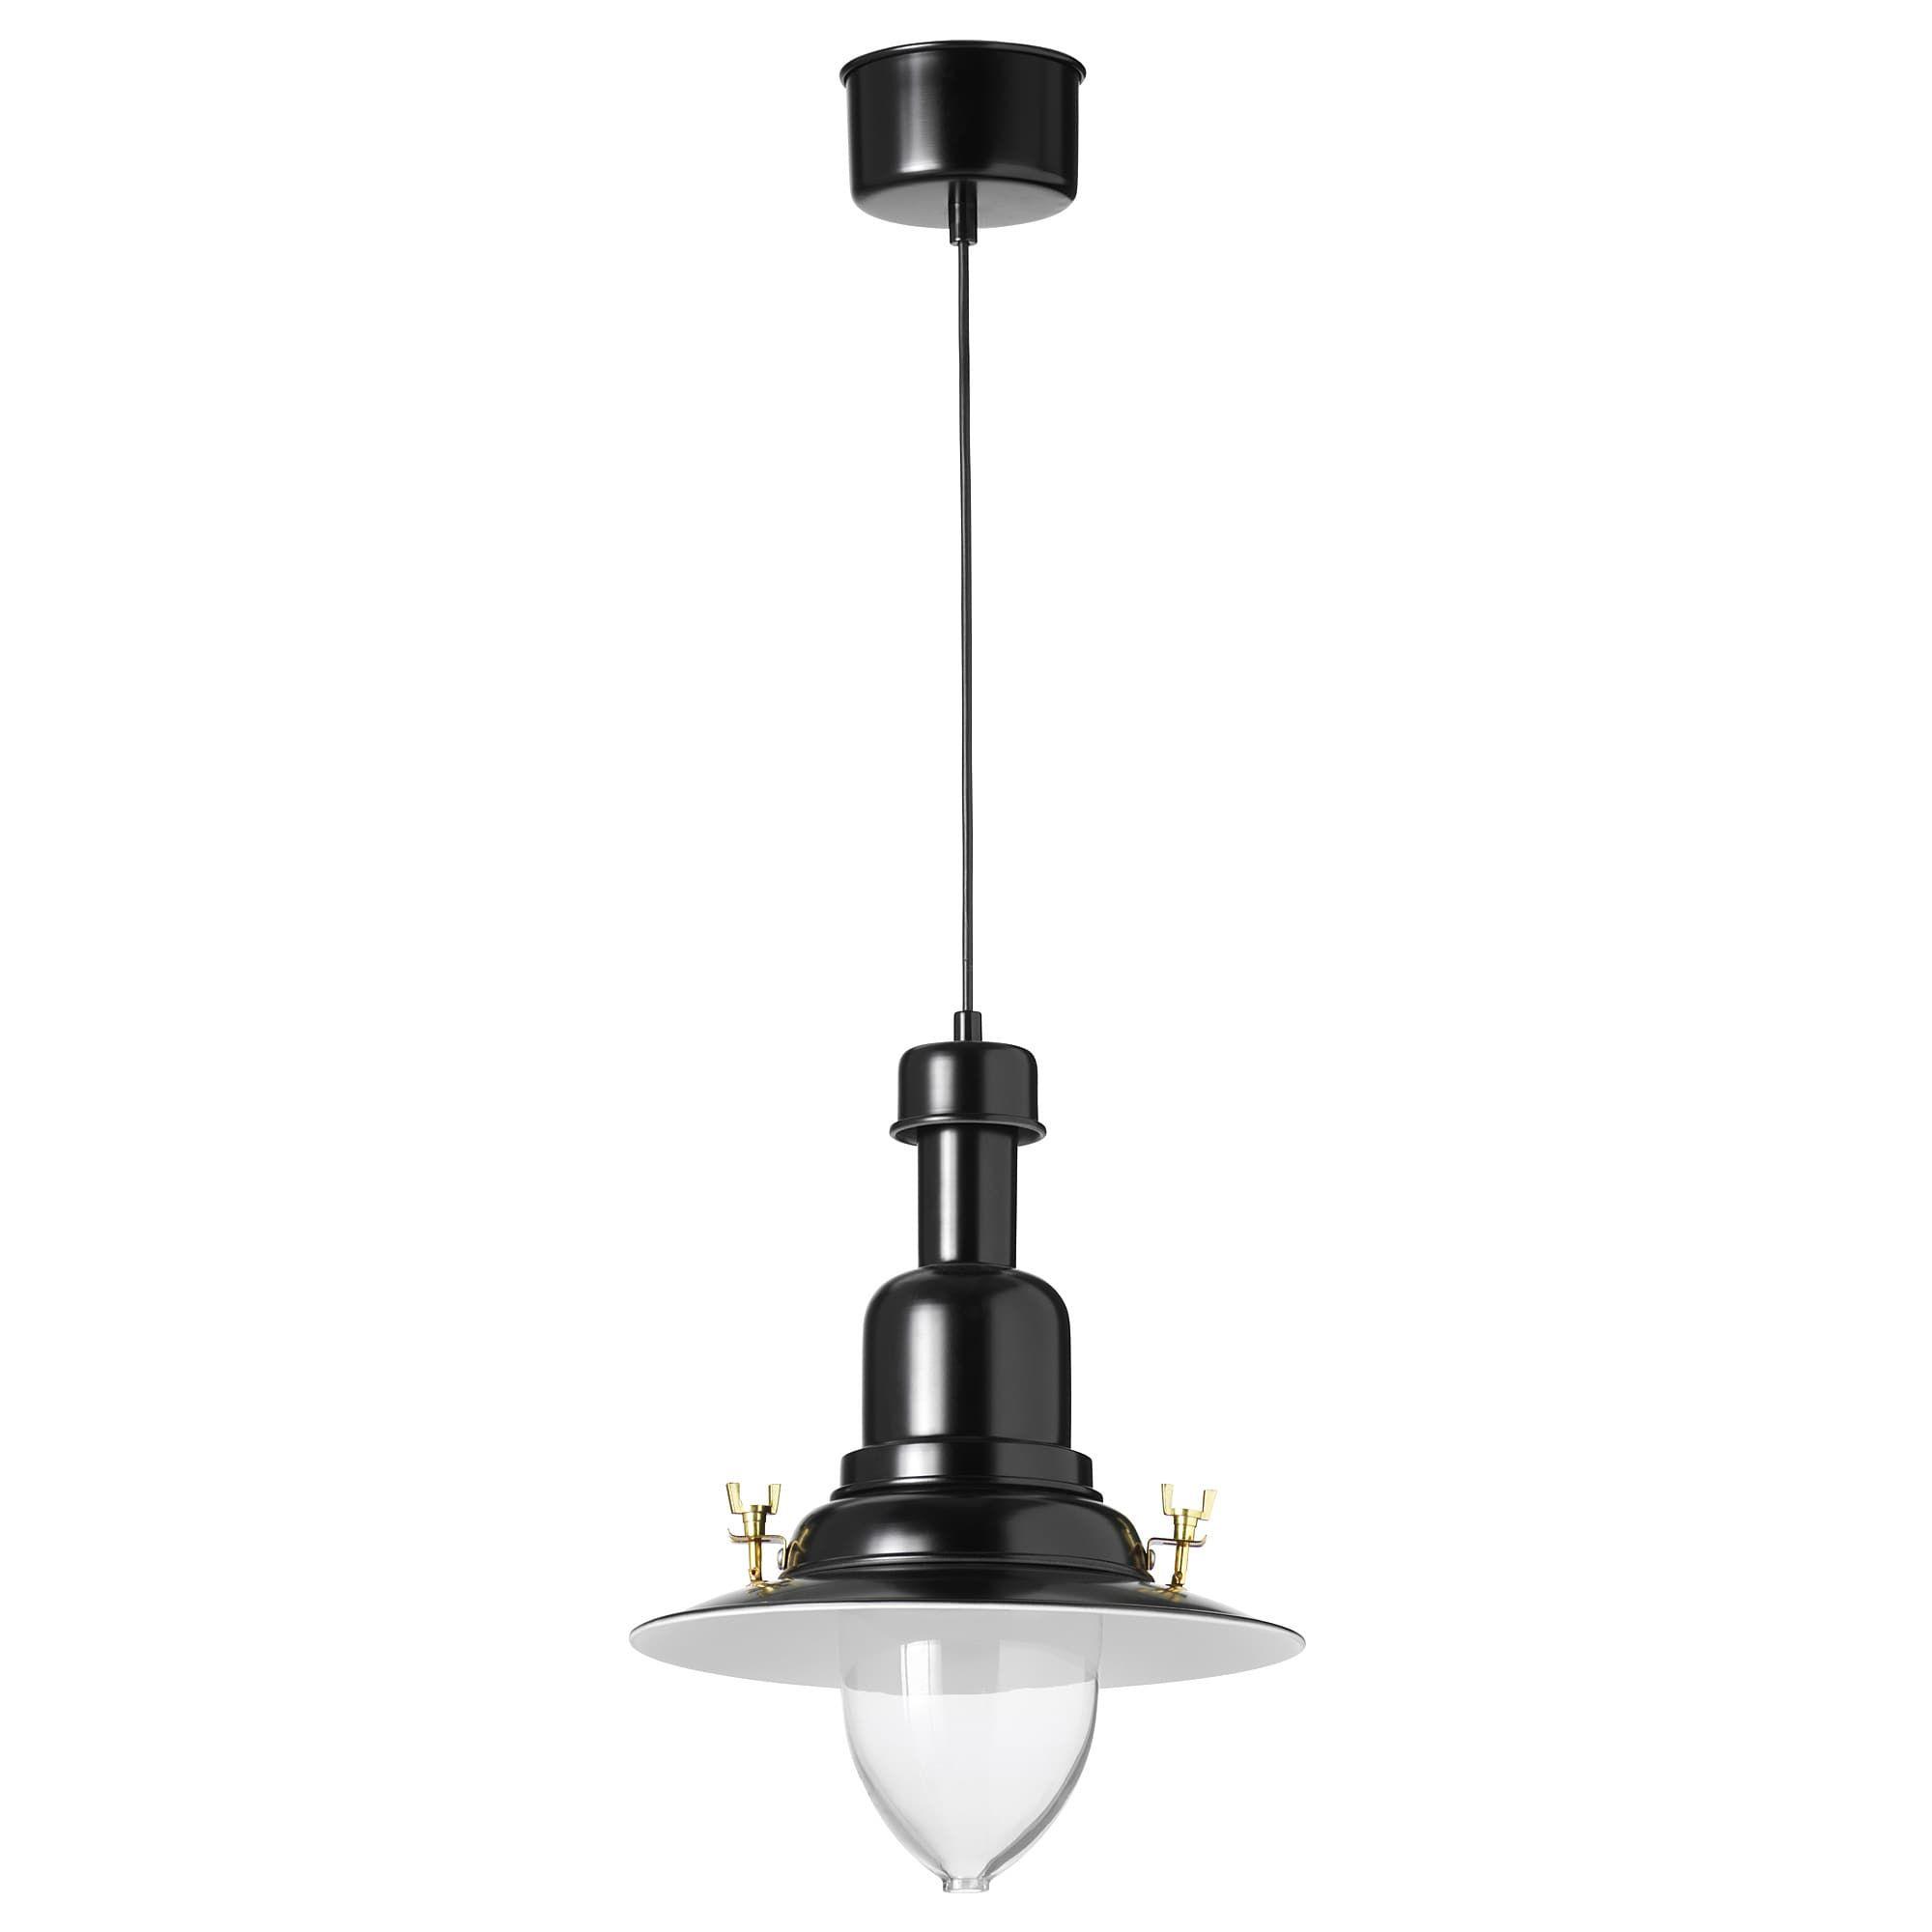 Ikea Ottava Black Pendant Lamp Pendant Lamp Clear Light Bulbs